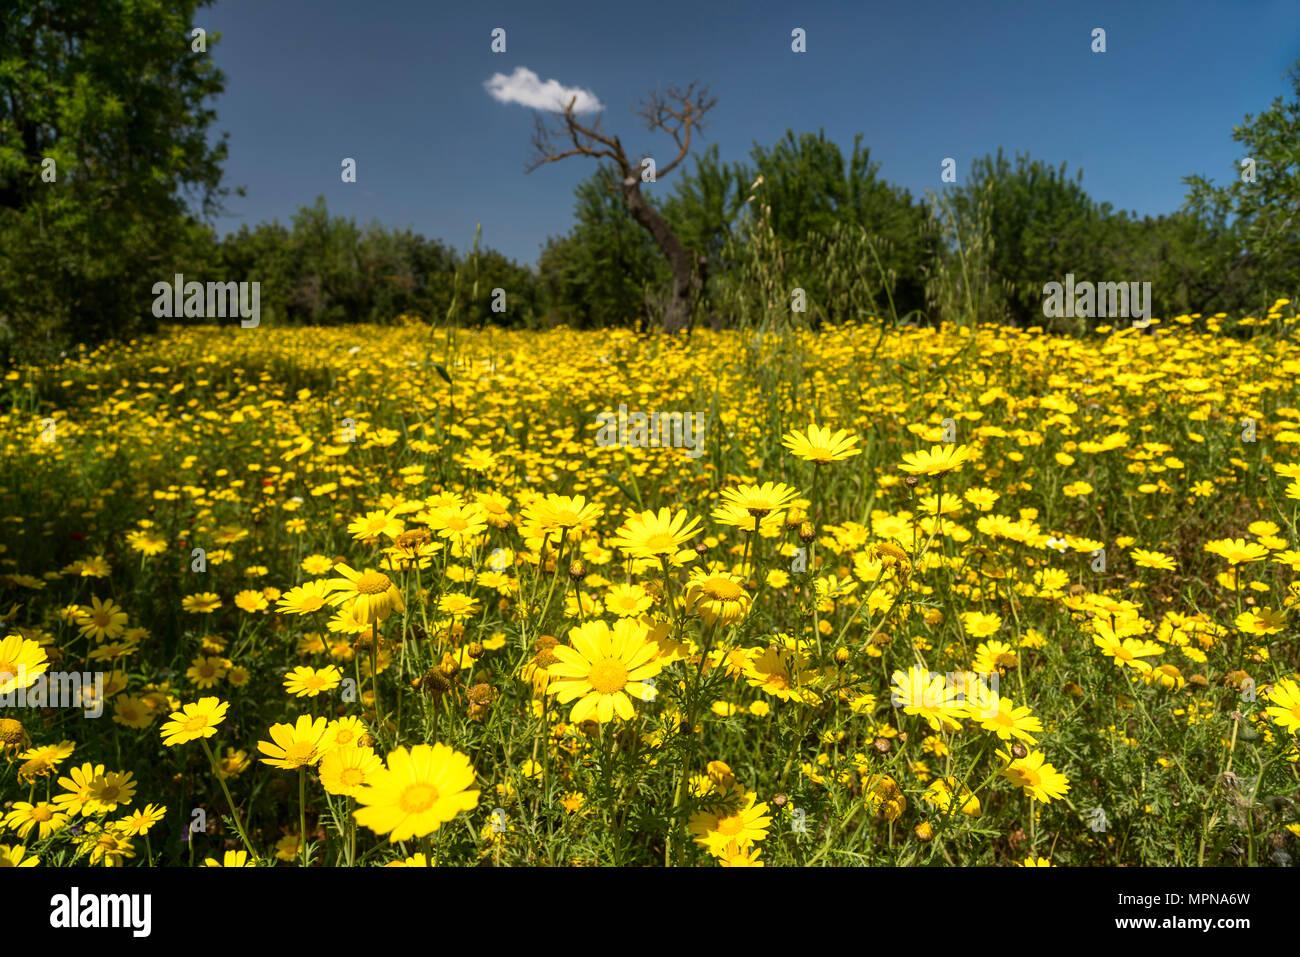 Wiese voller gelber Frhlingsblumen Mallorca Balearen Spanien  Frhlingswiese mit gelben